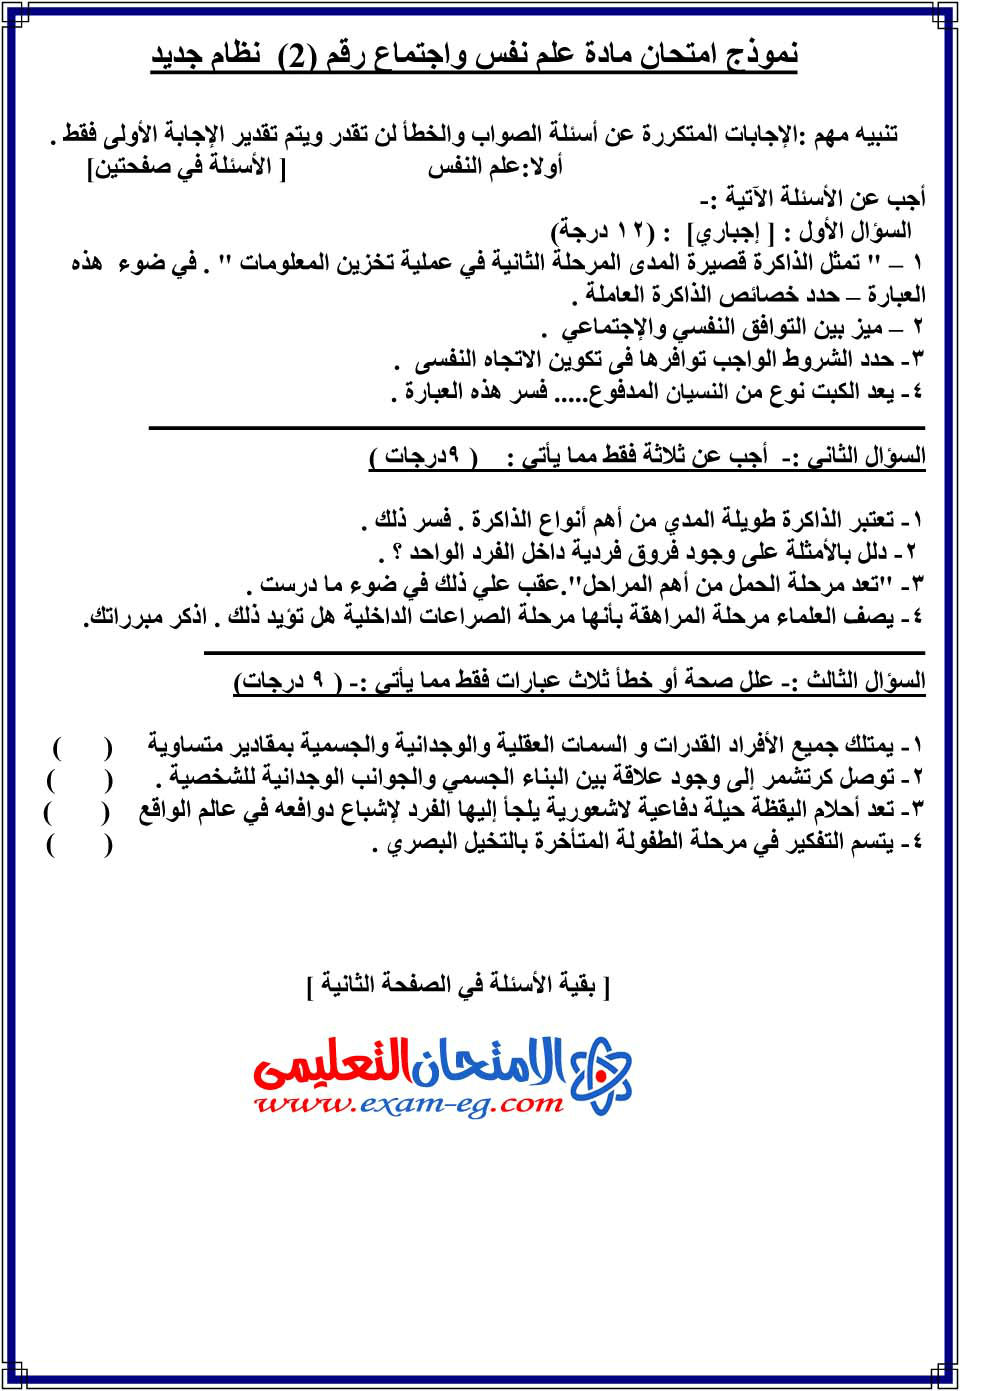 exam-eg.com_1396624098811.jpg